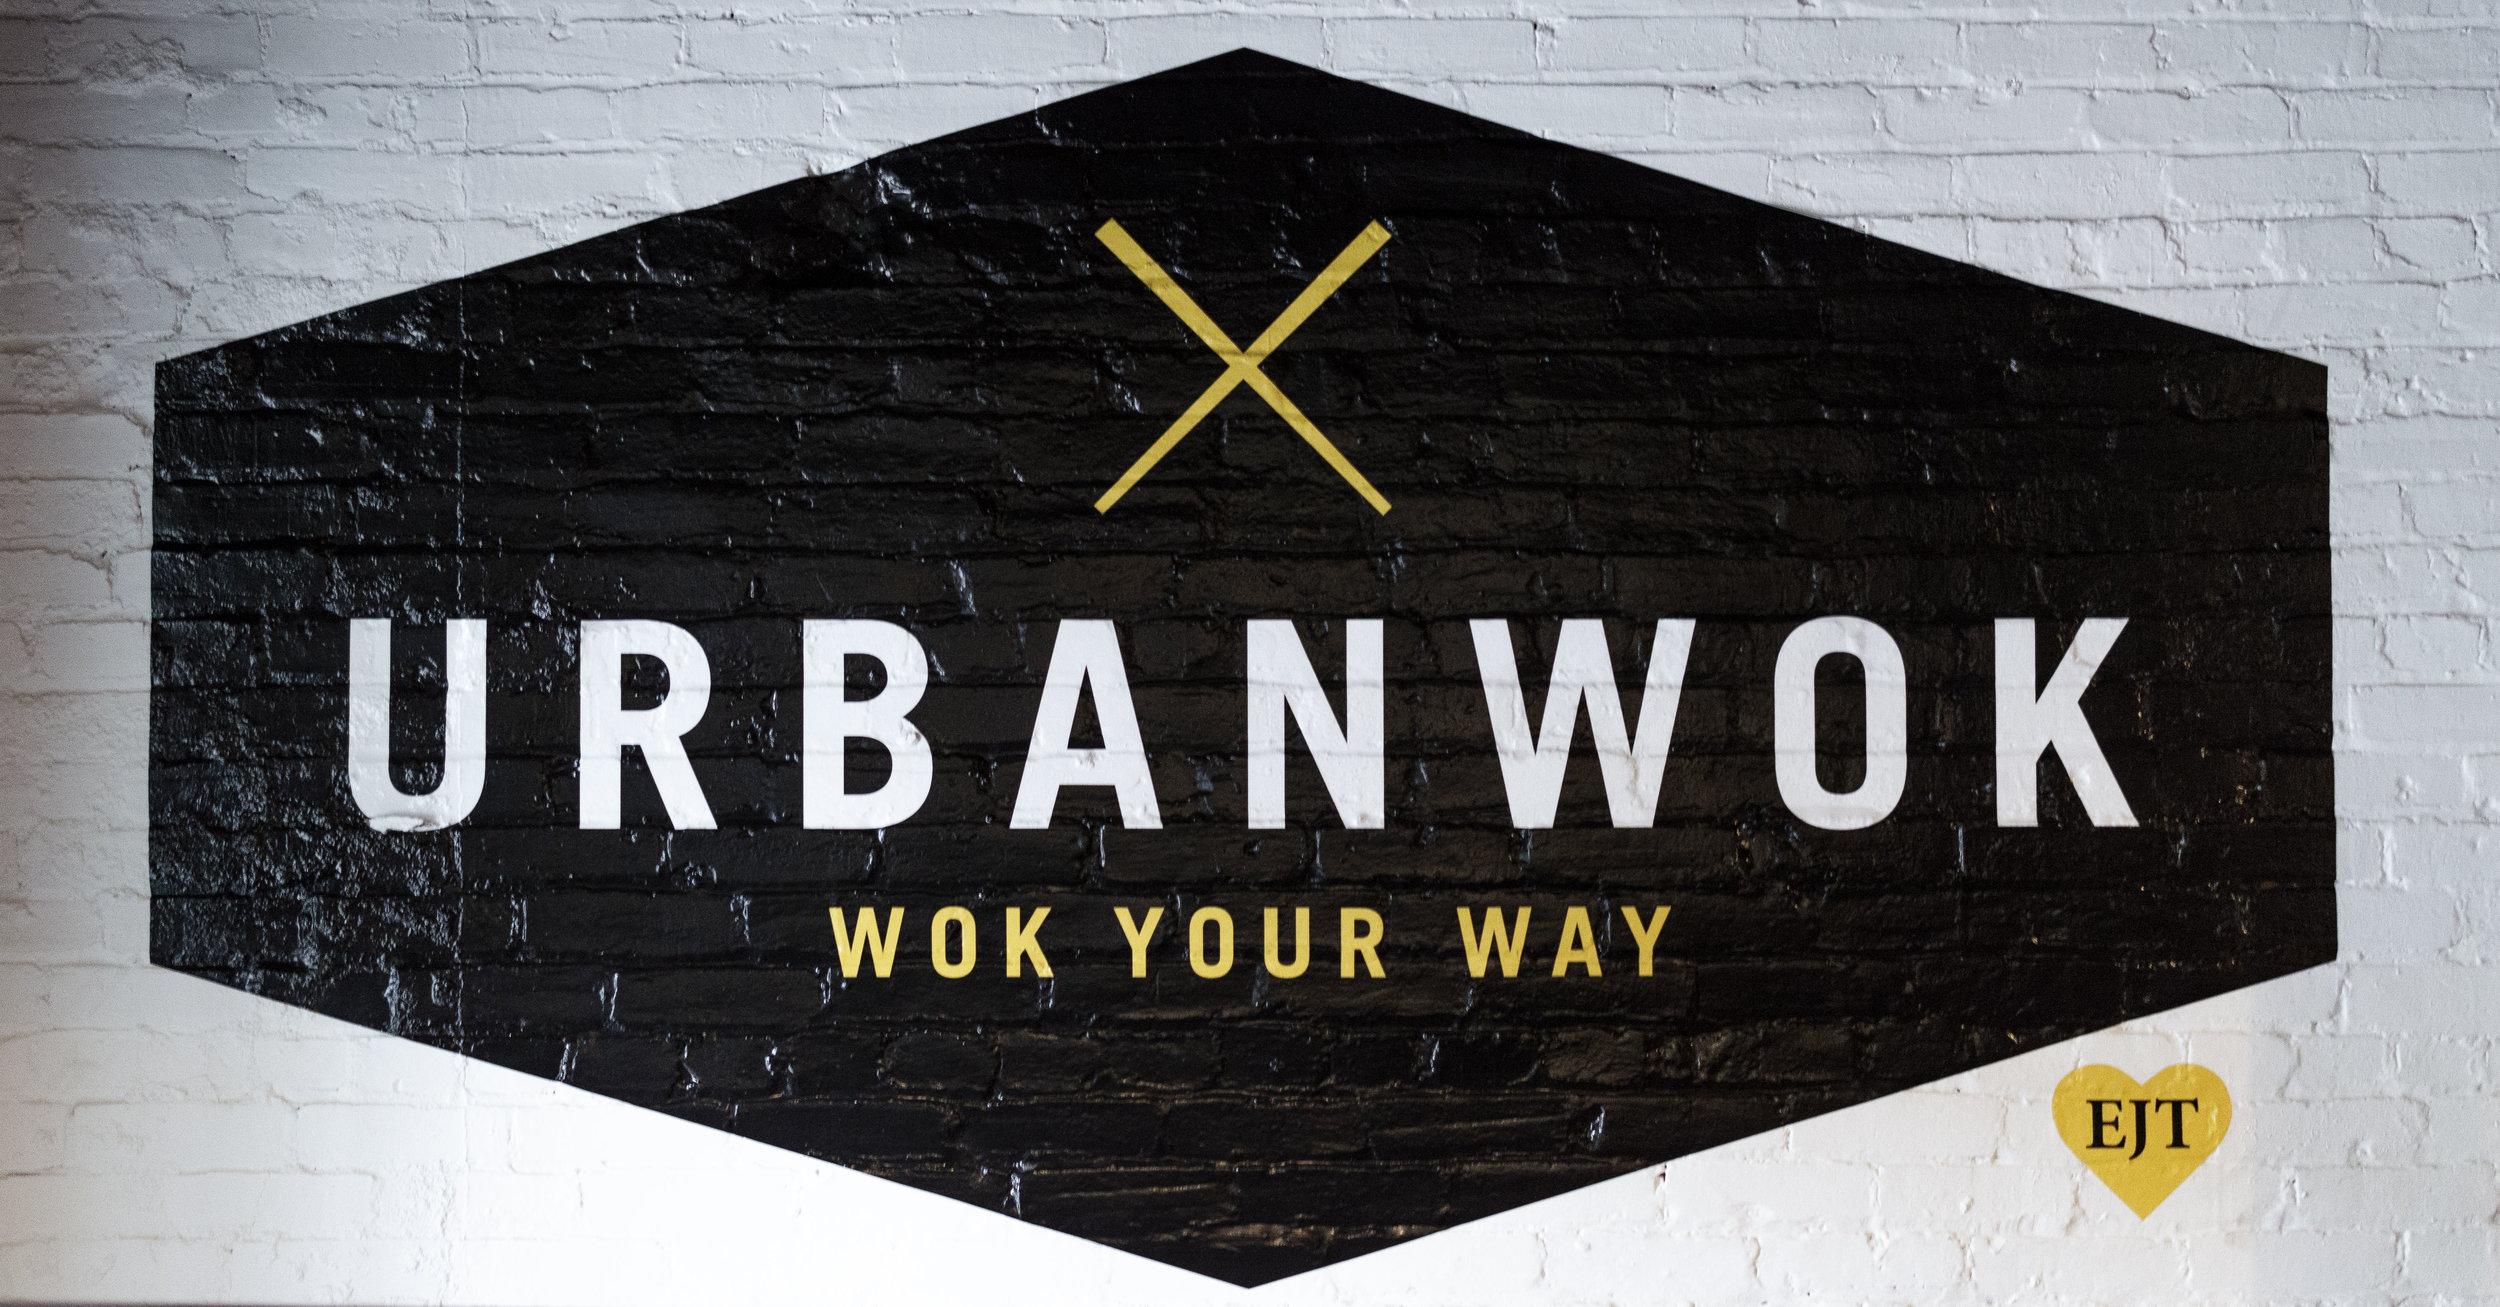 Urban Wok Artwork Lowertown St. Paul